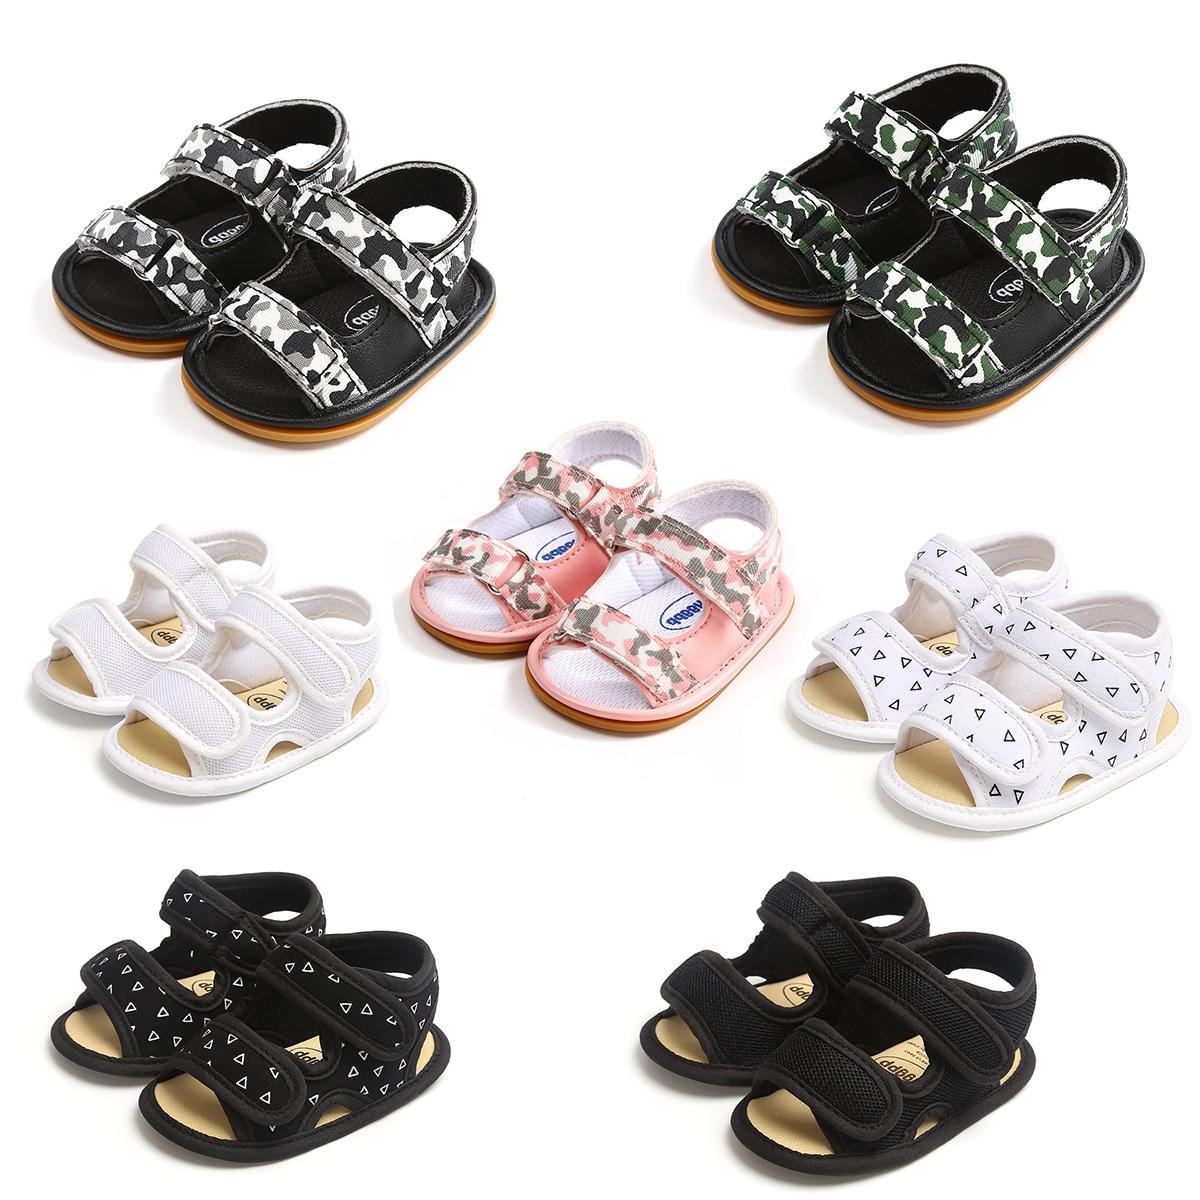 2020 Children Summer Baby Shoes Newborn Infant Baby Girl Boy Soft Crib Shoes Infants Anti-slip Sneaker Prewalker 0-18M